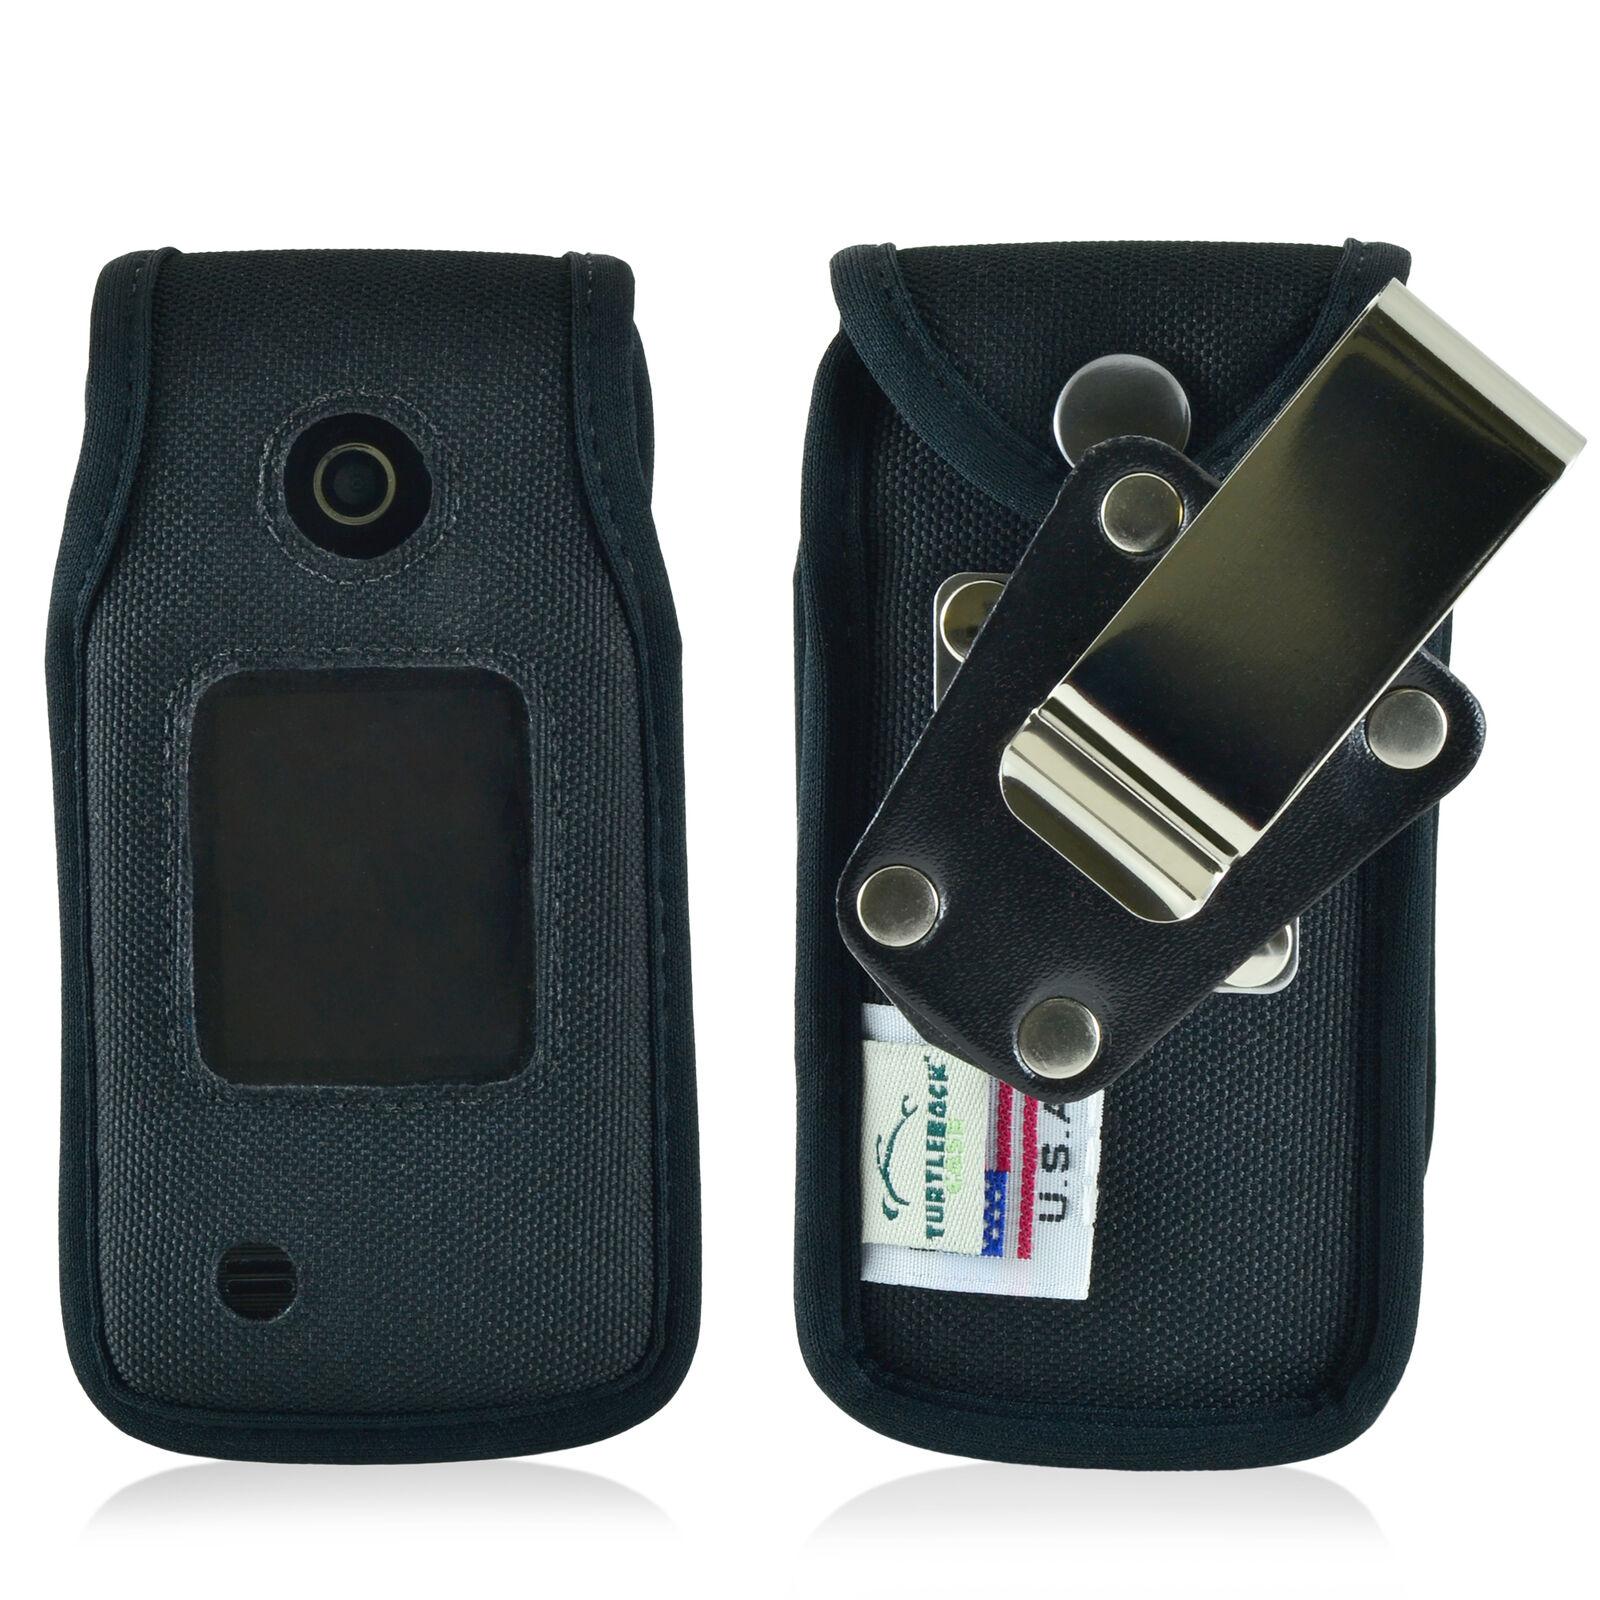 lg-terra-vn210-flip-phone-case-turtleback-black-nylon-removable-metal-clip